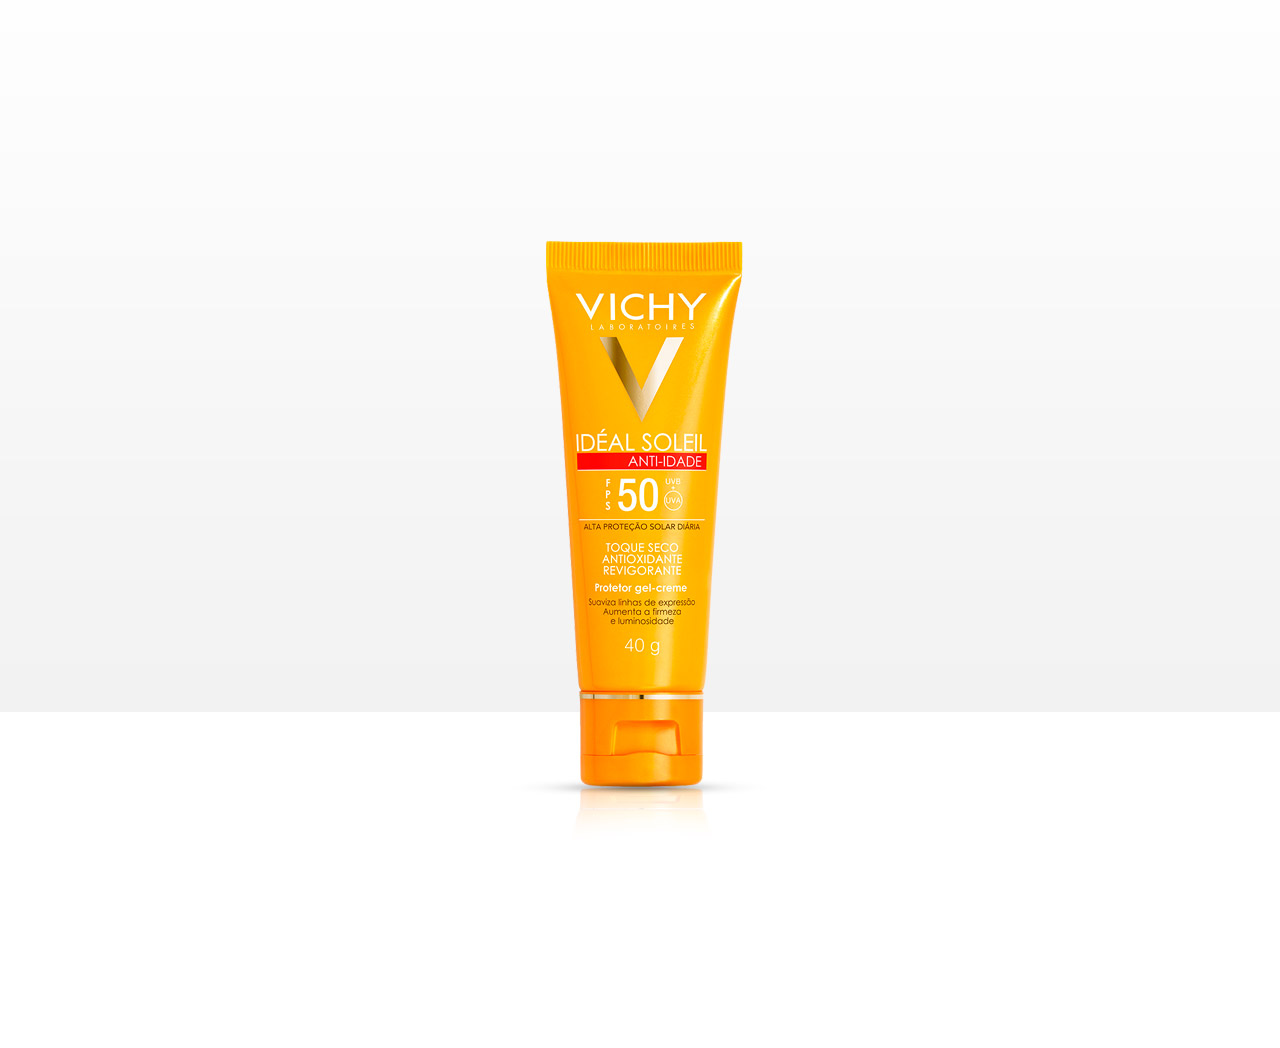 Protetor Solar Facial Vichy Ideal Soleil Anti-idade FPS50 - 40g